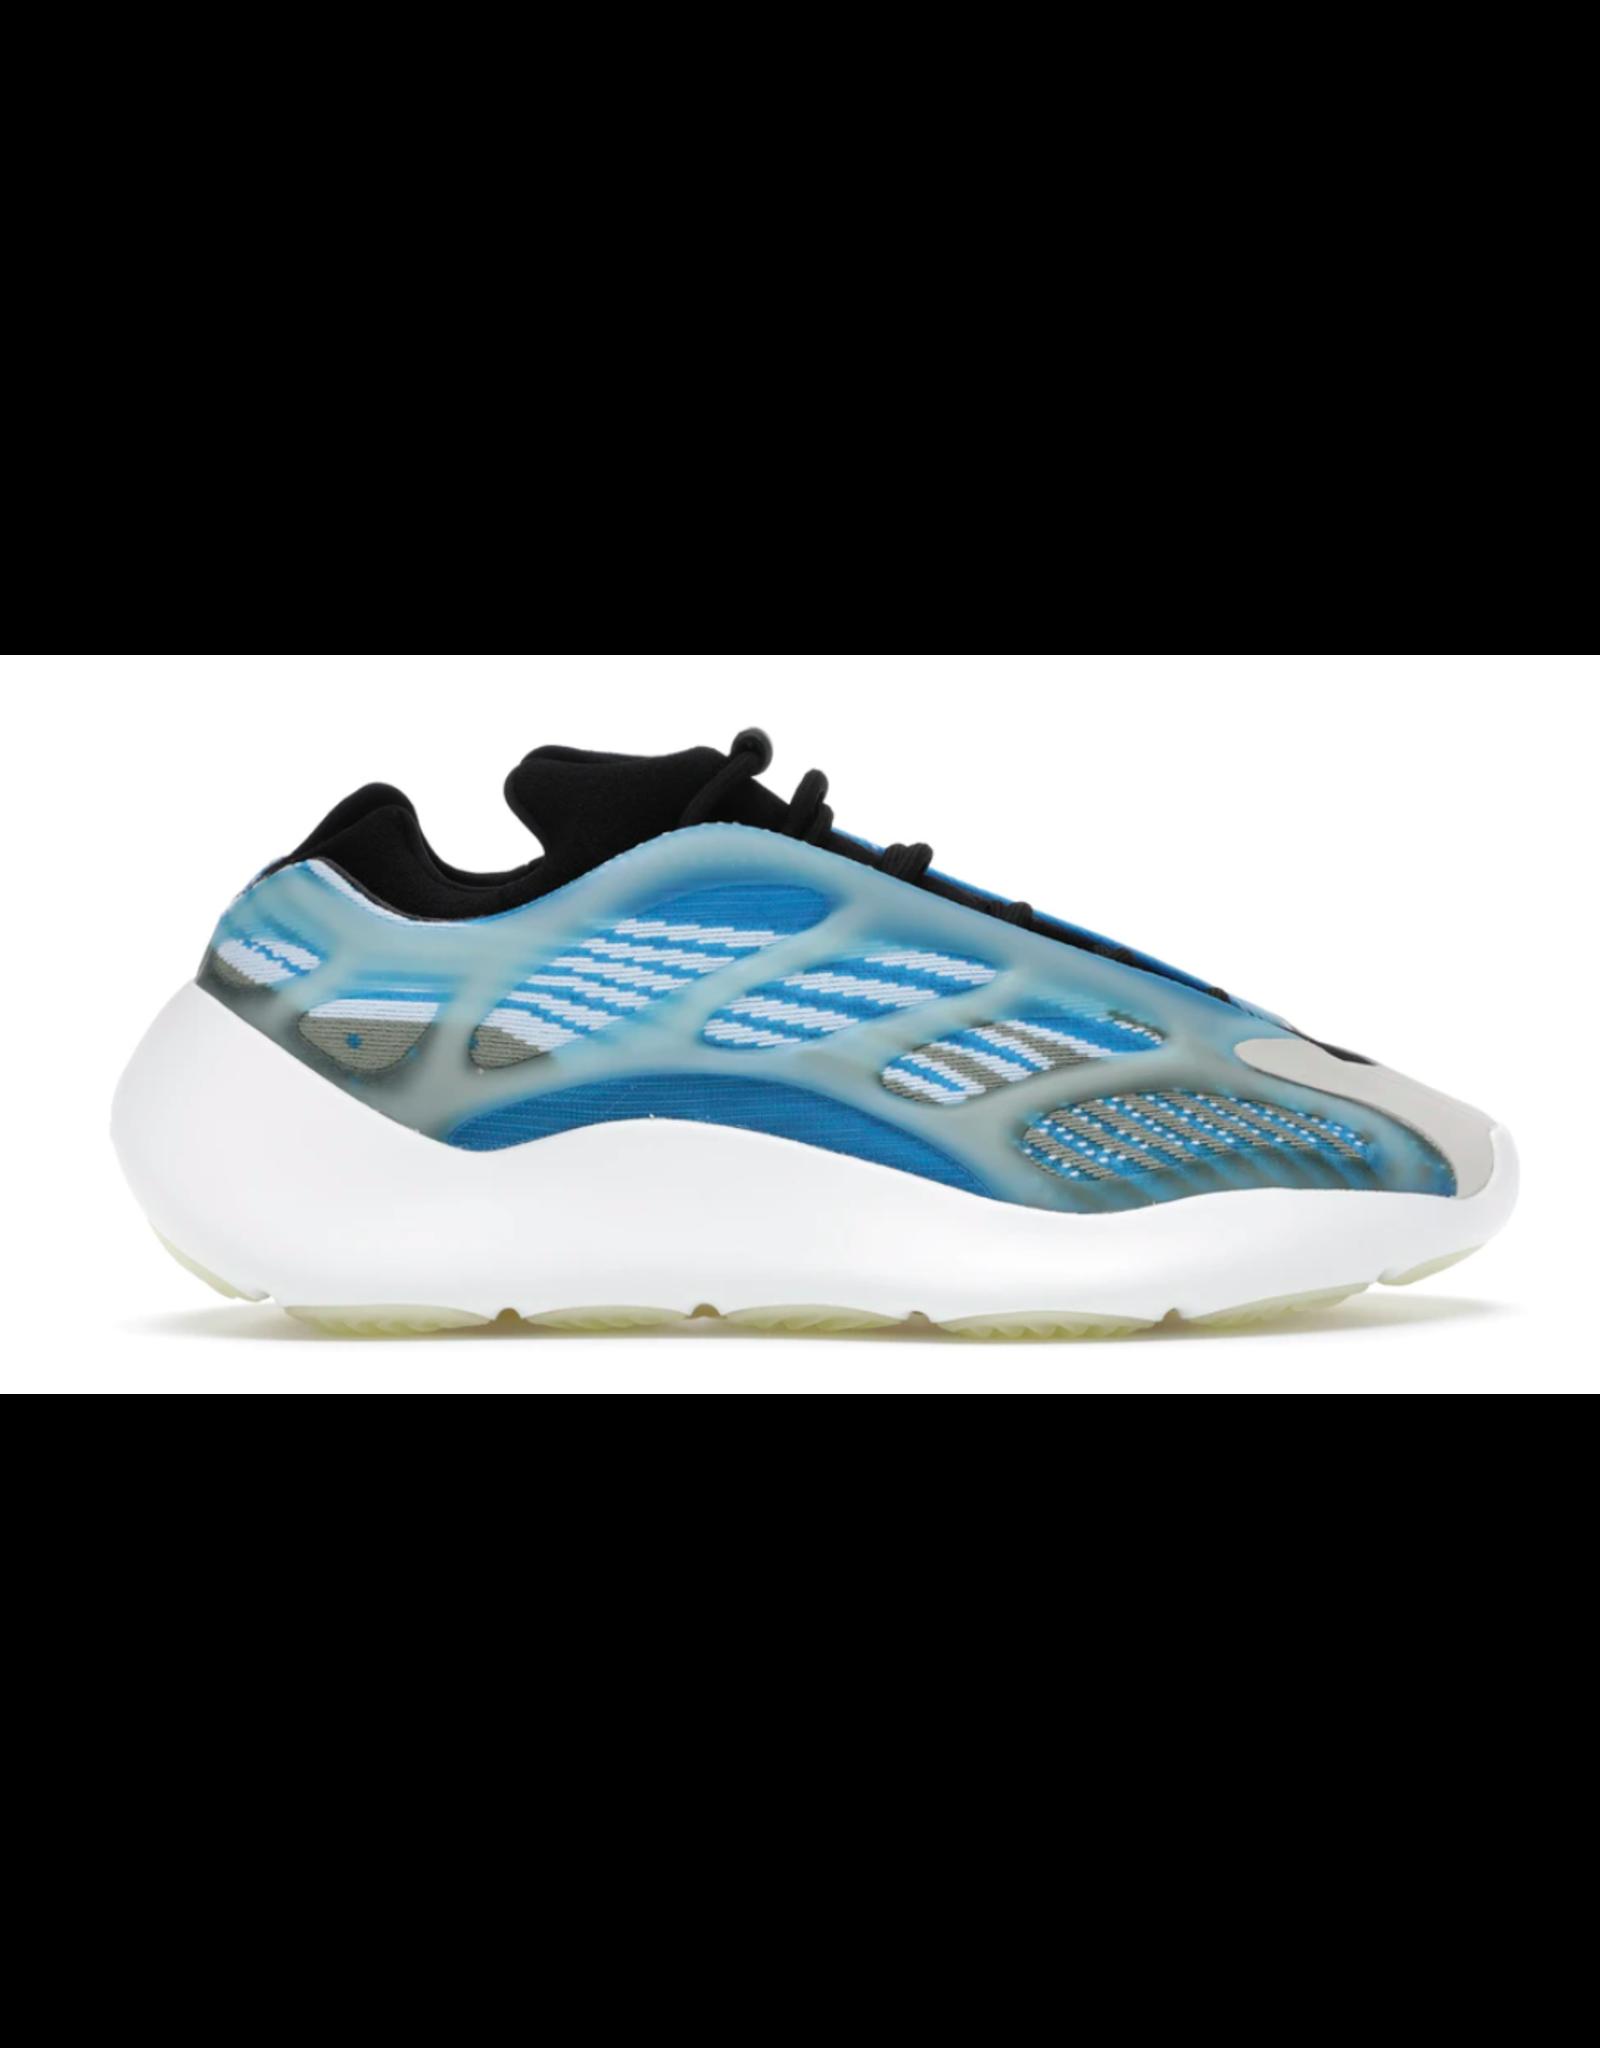 YEEZY adidas Yeezy 700 V3 Arzareth